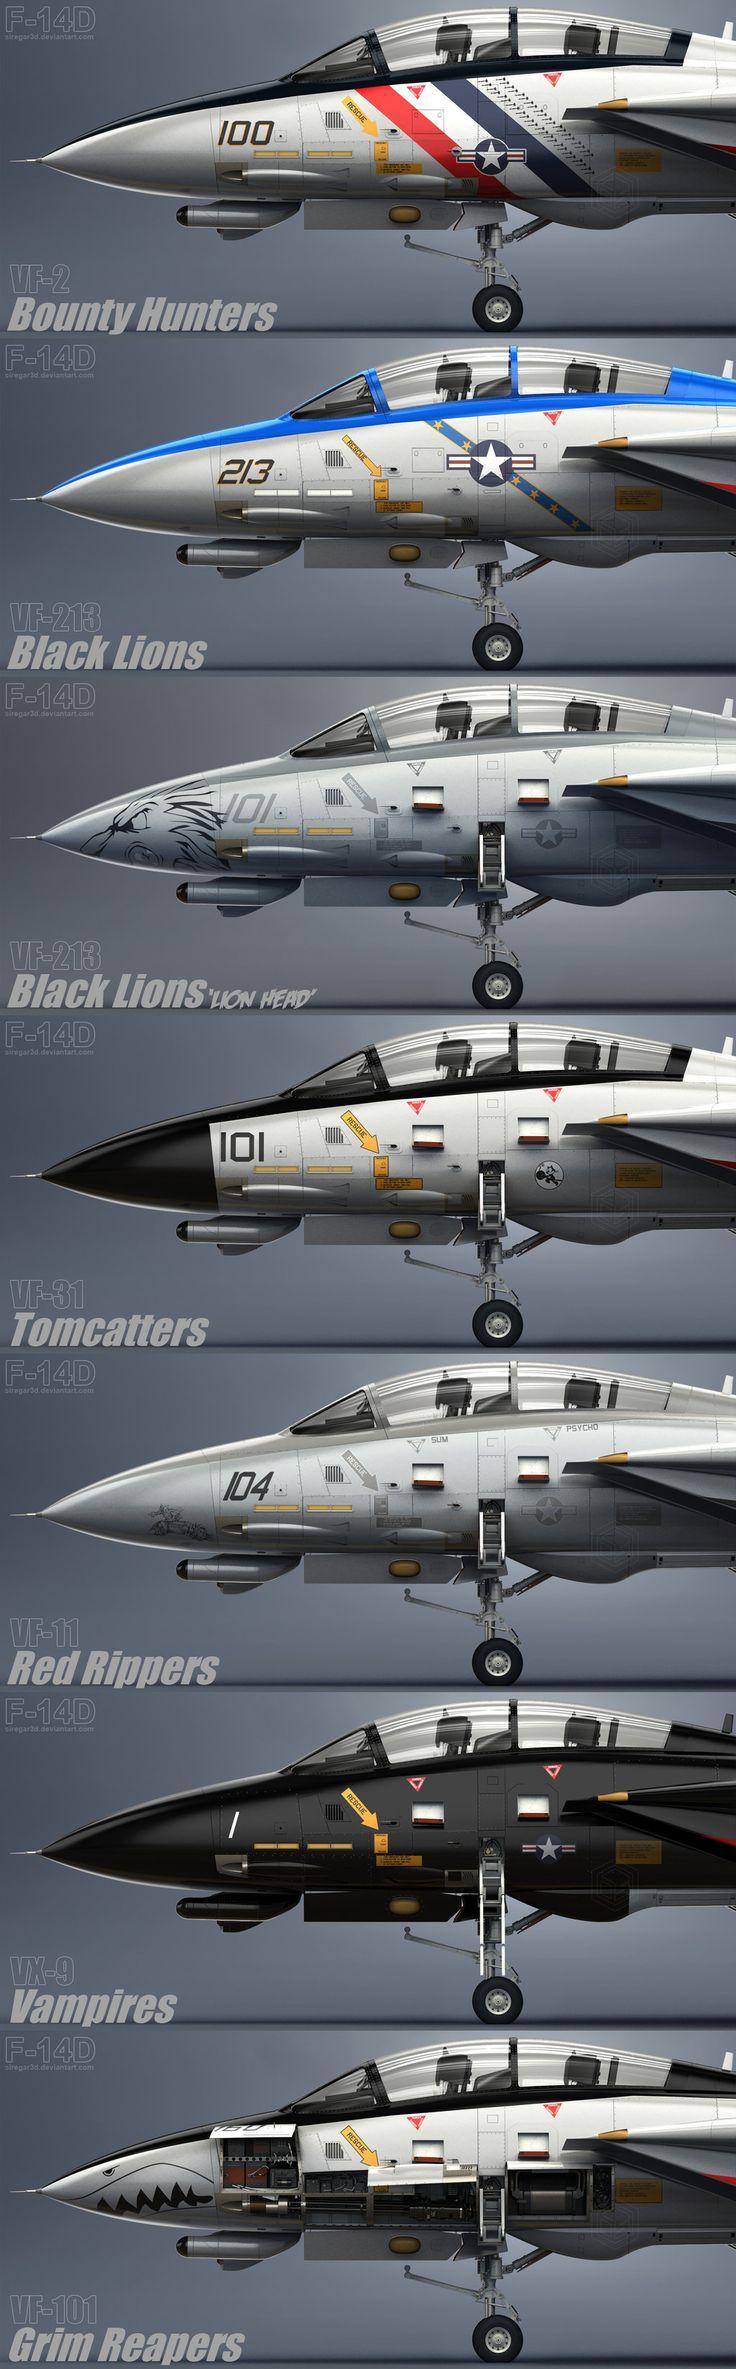 F-14 Tomcat squadrons. Very COOL!!